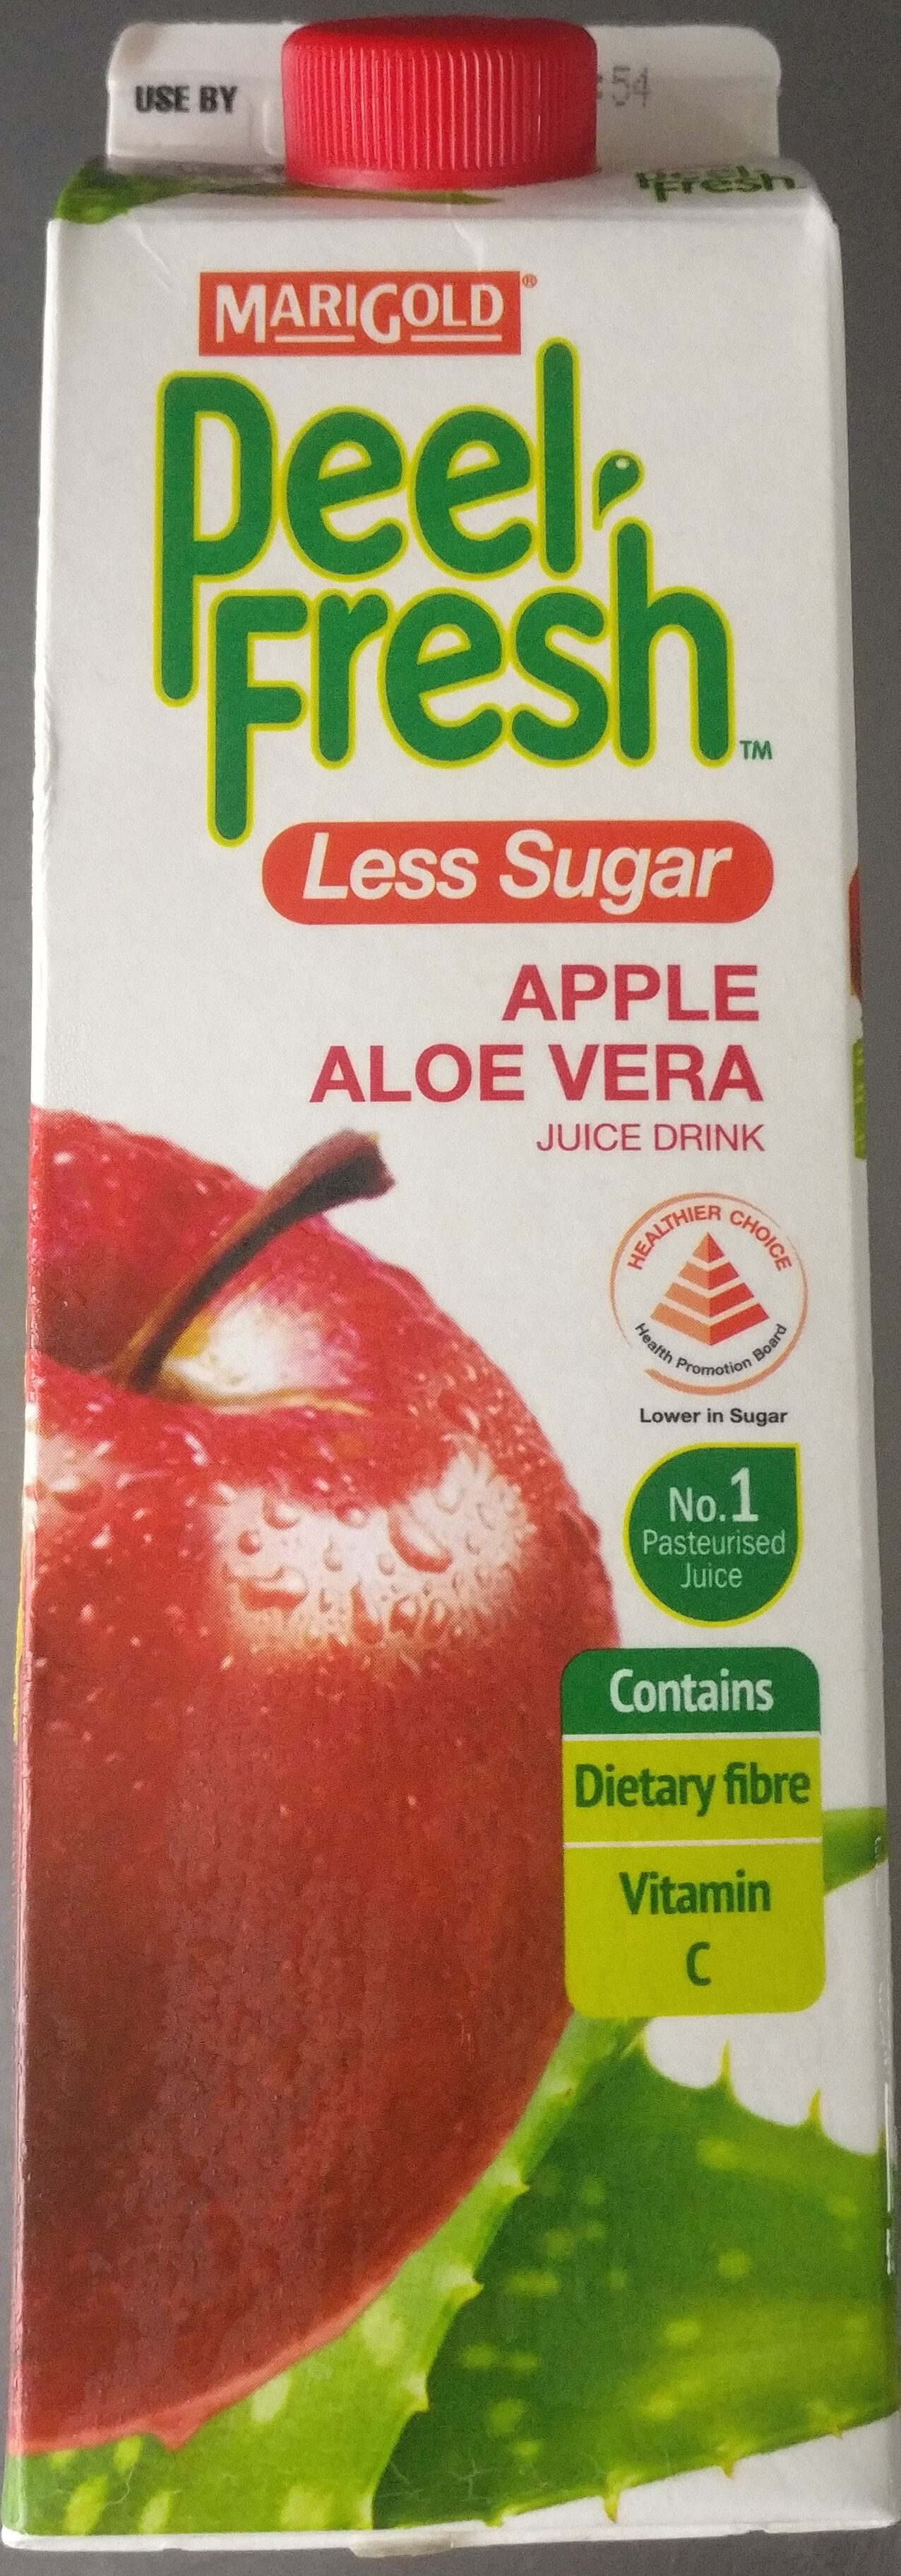 Peel Fresh Less Sugar Apple Aloe Vera Juice Drink - Product - en